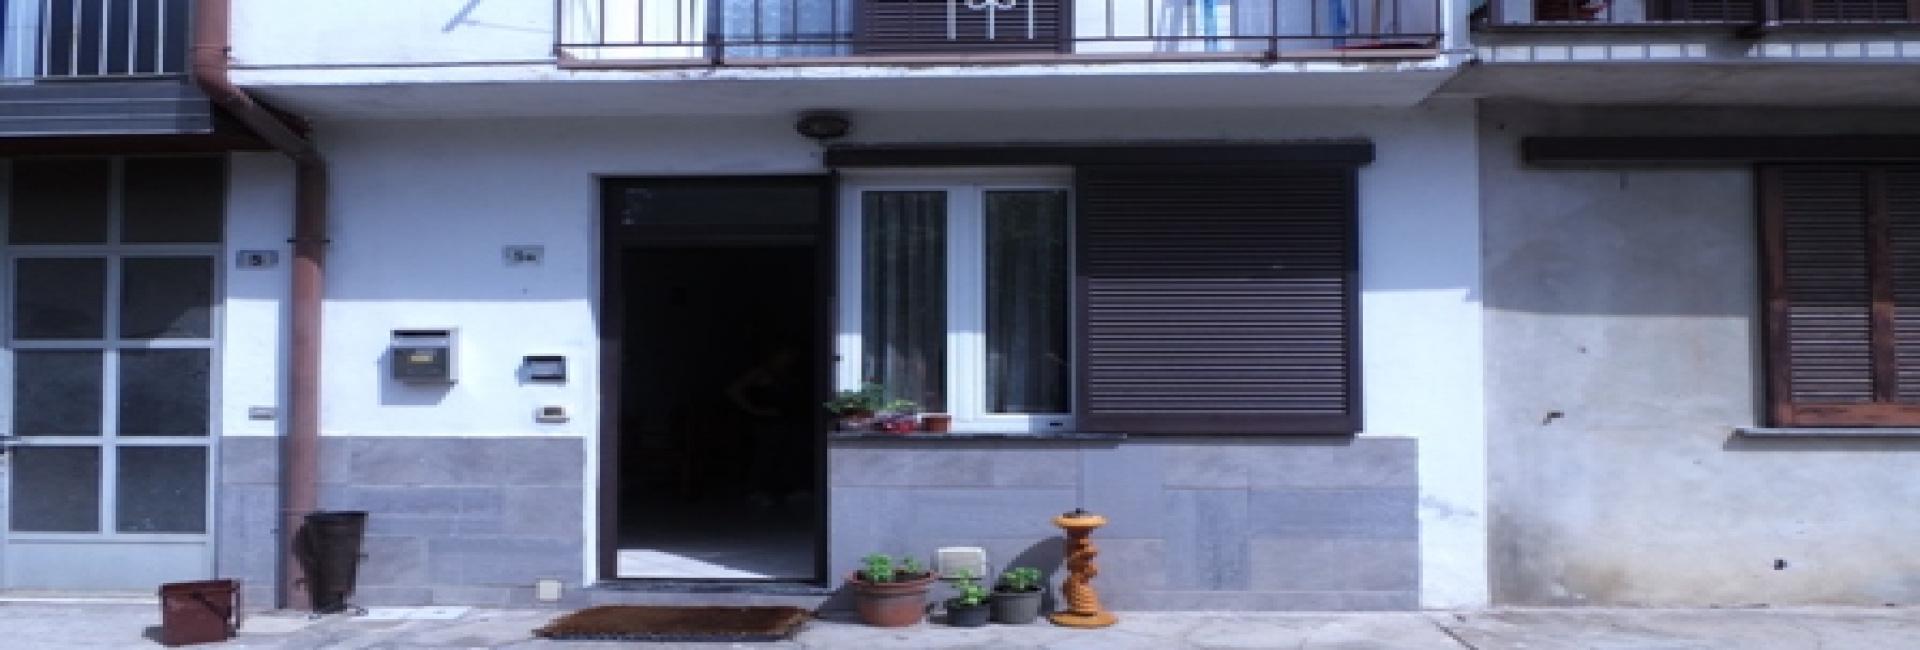 Indirizzo non disponibile, 2 Bedrooms Bedrooms, 4 Rooms Rooms,2 BathroomsBathrooms,Porzione di casa,Vende,VIA ROMA,1119